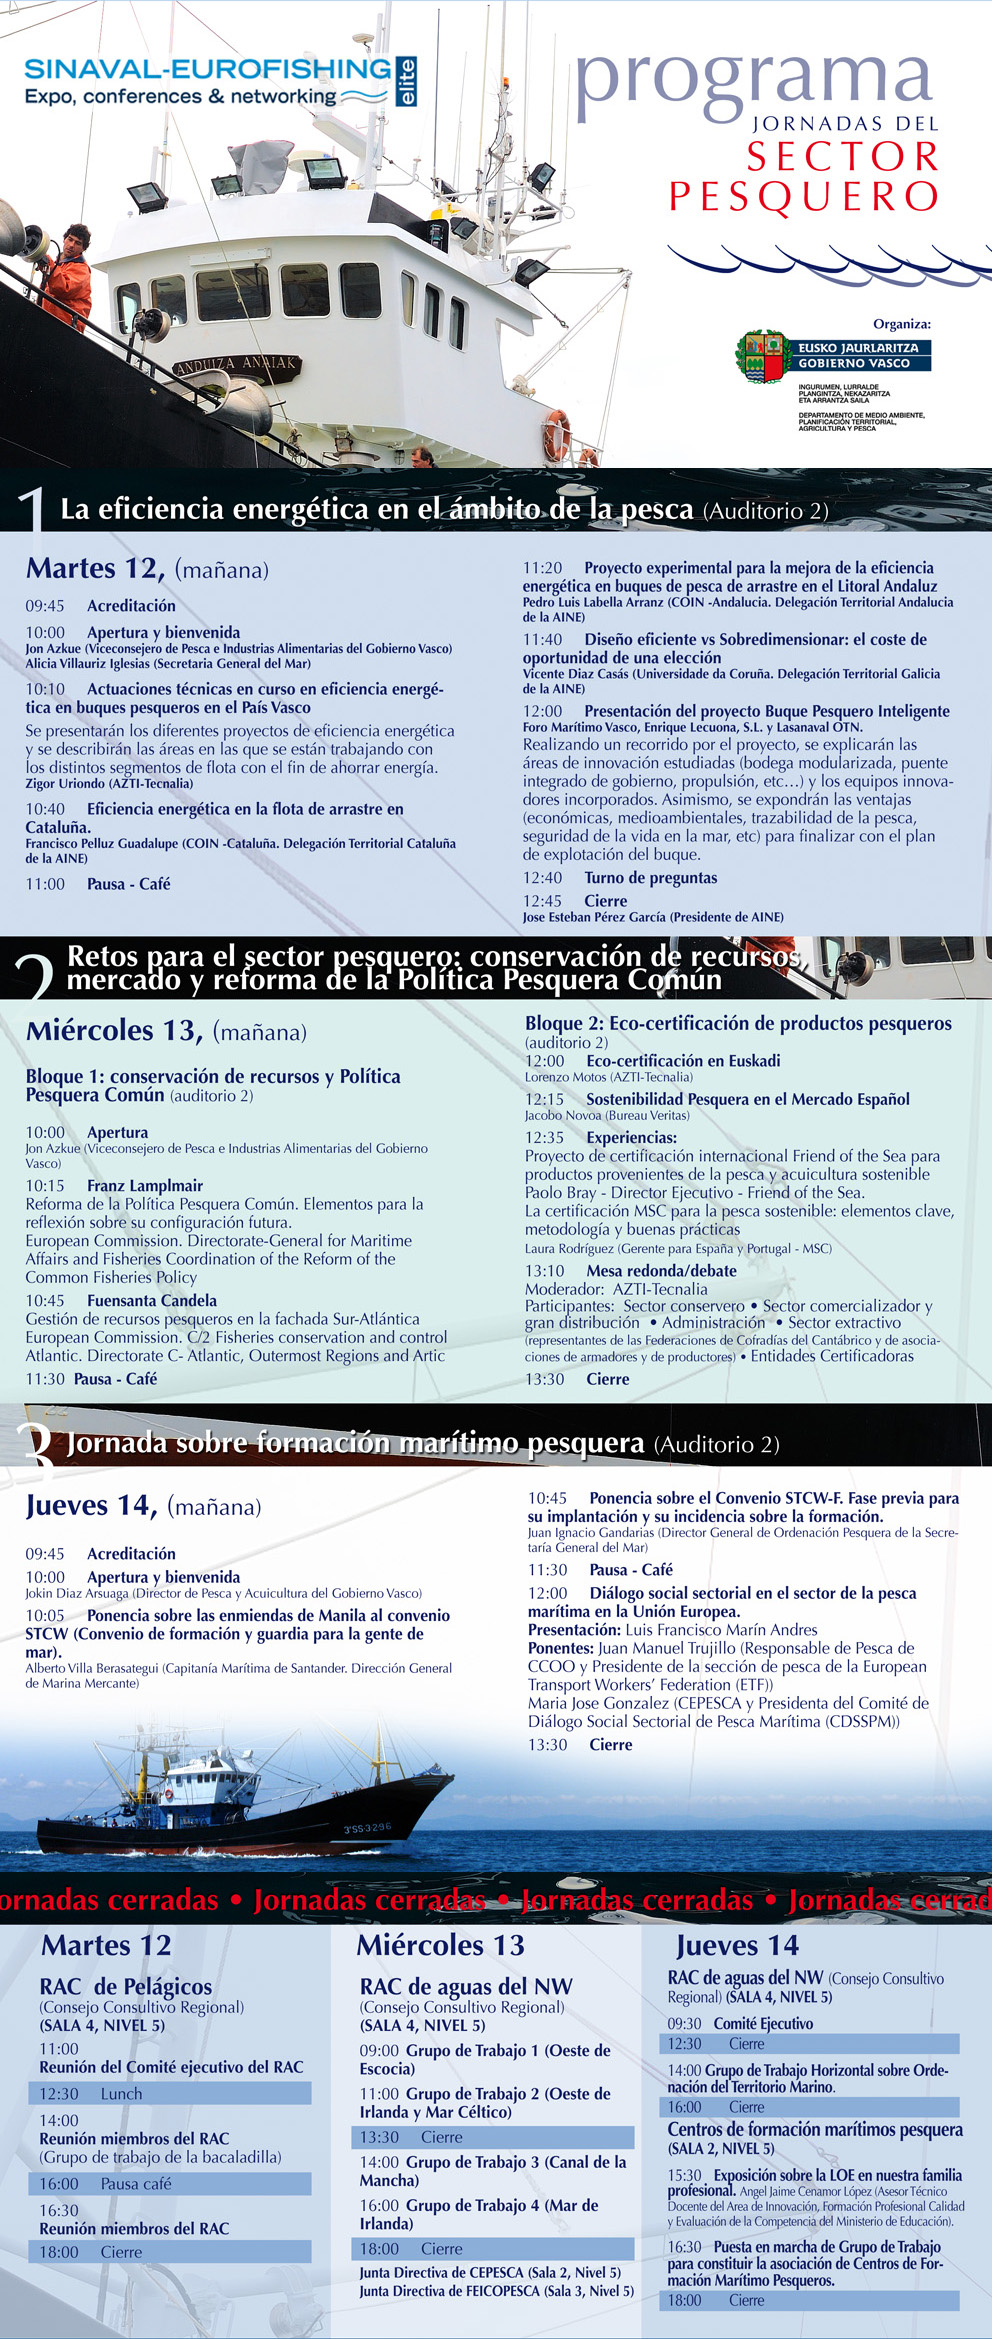 PESCA_mailing_castellano.jpg